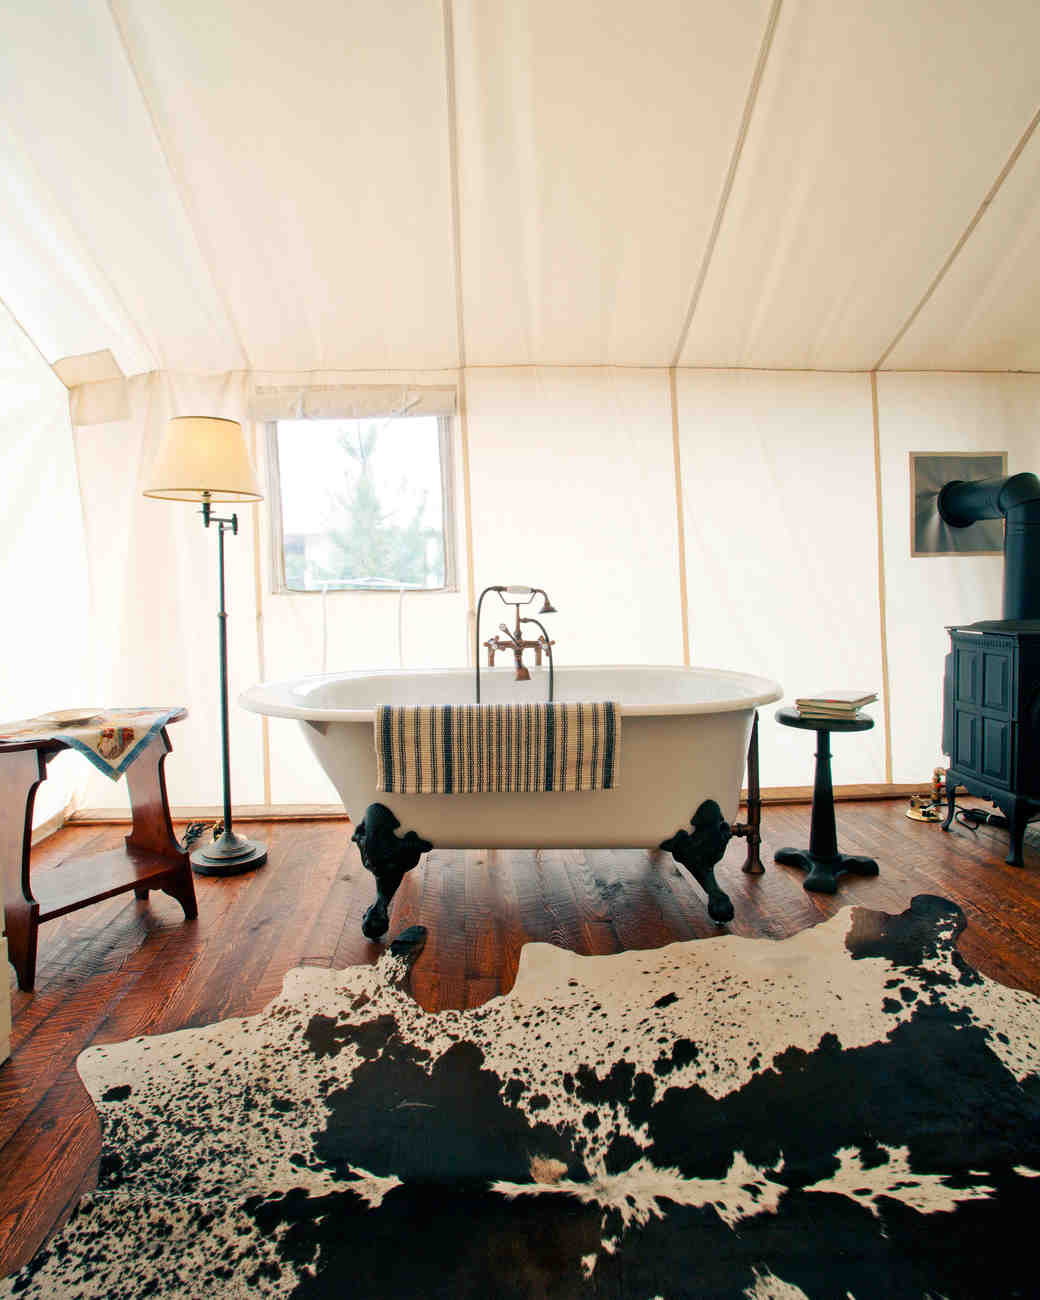 glamping-honeymoon-resorts-ranch-at-rock-creek-0515.jpg